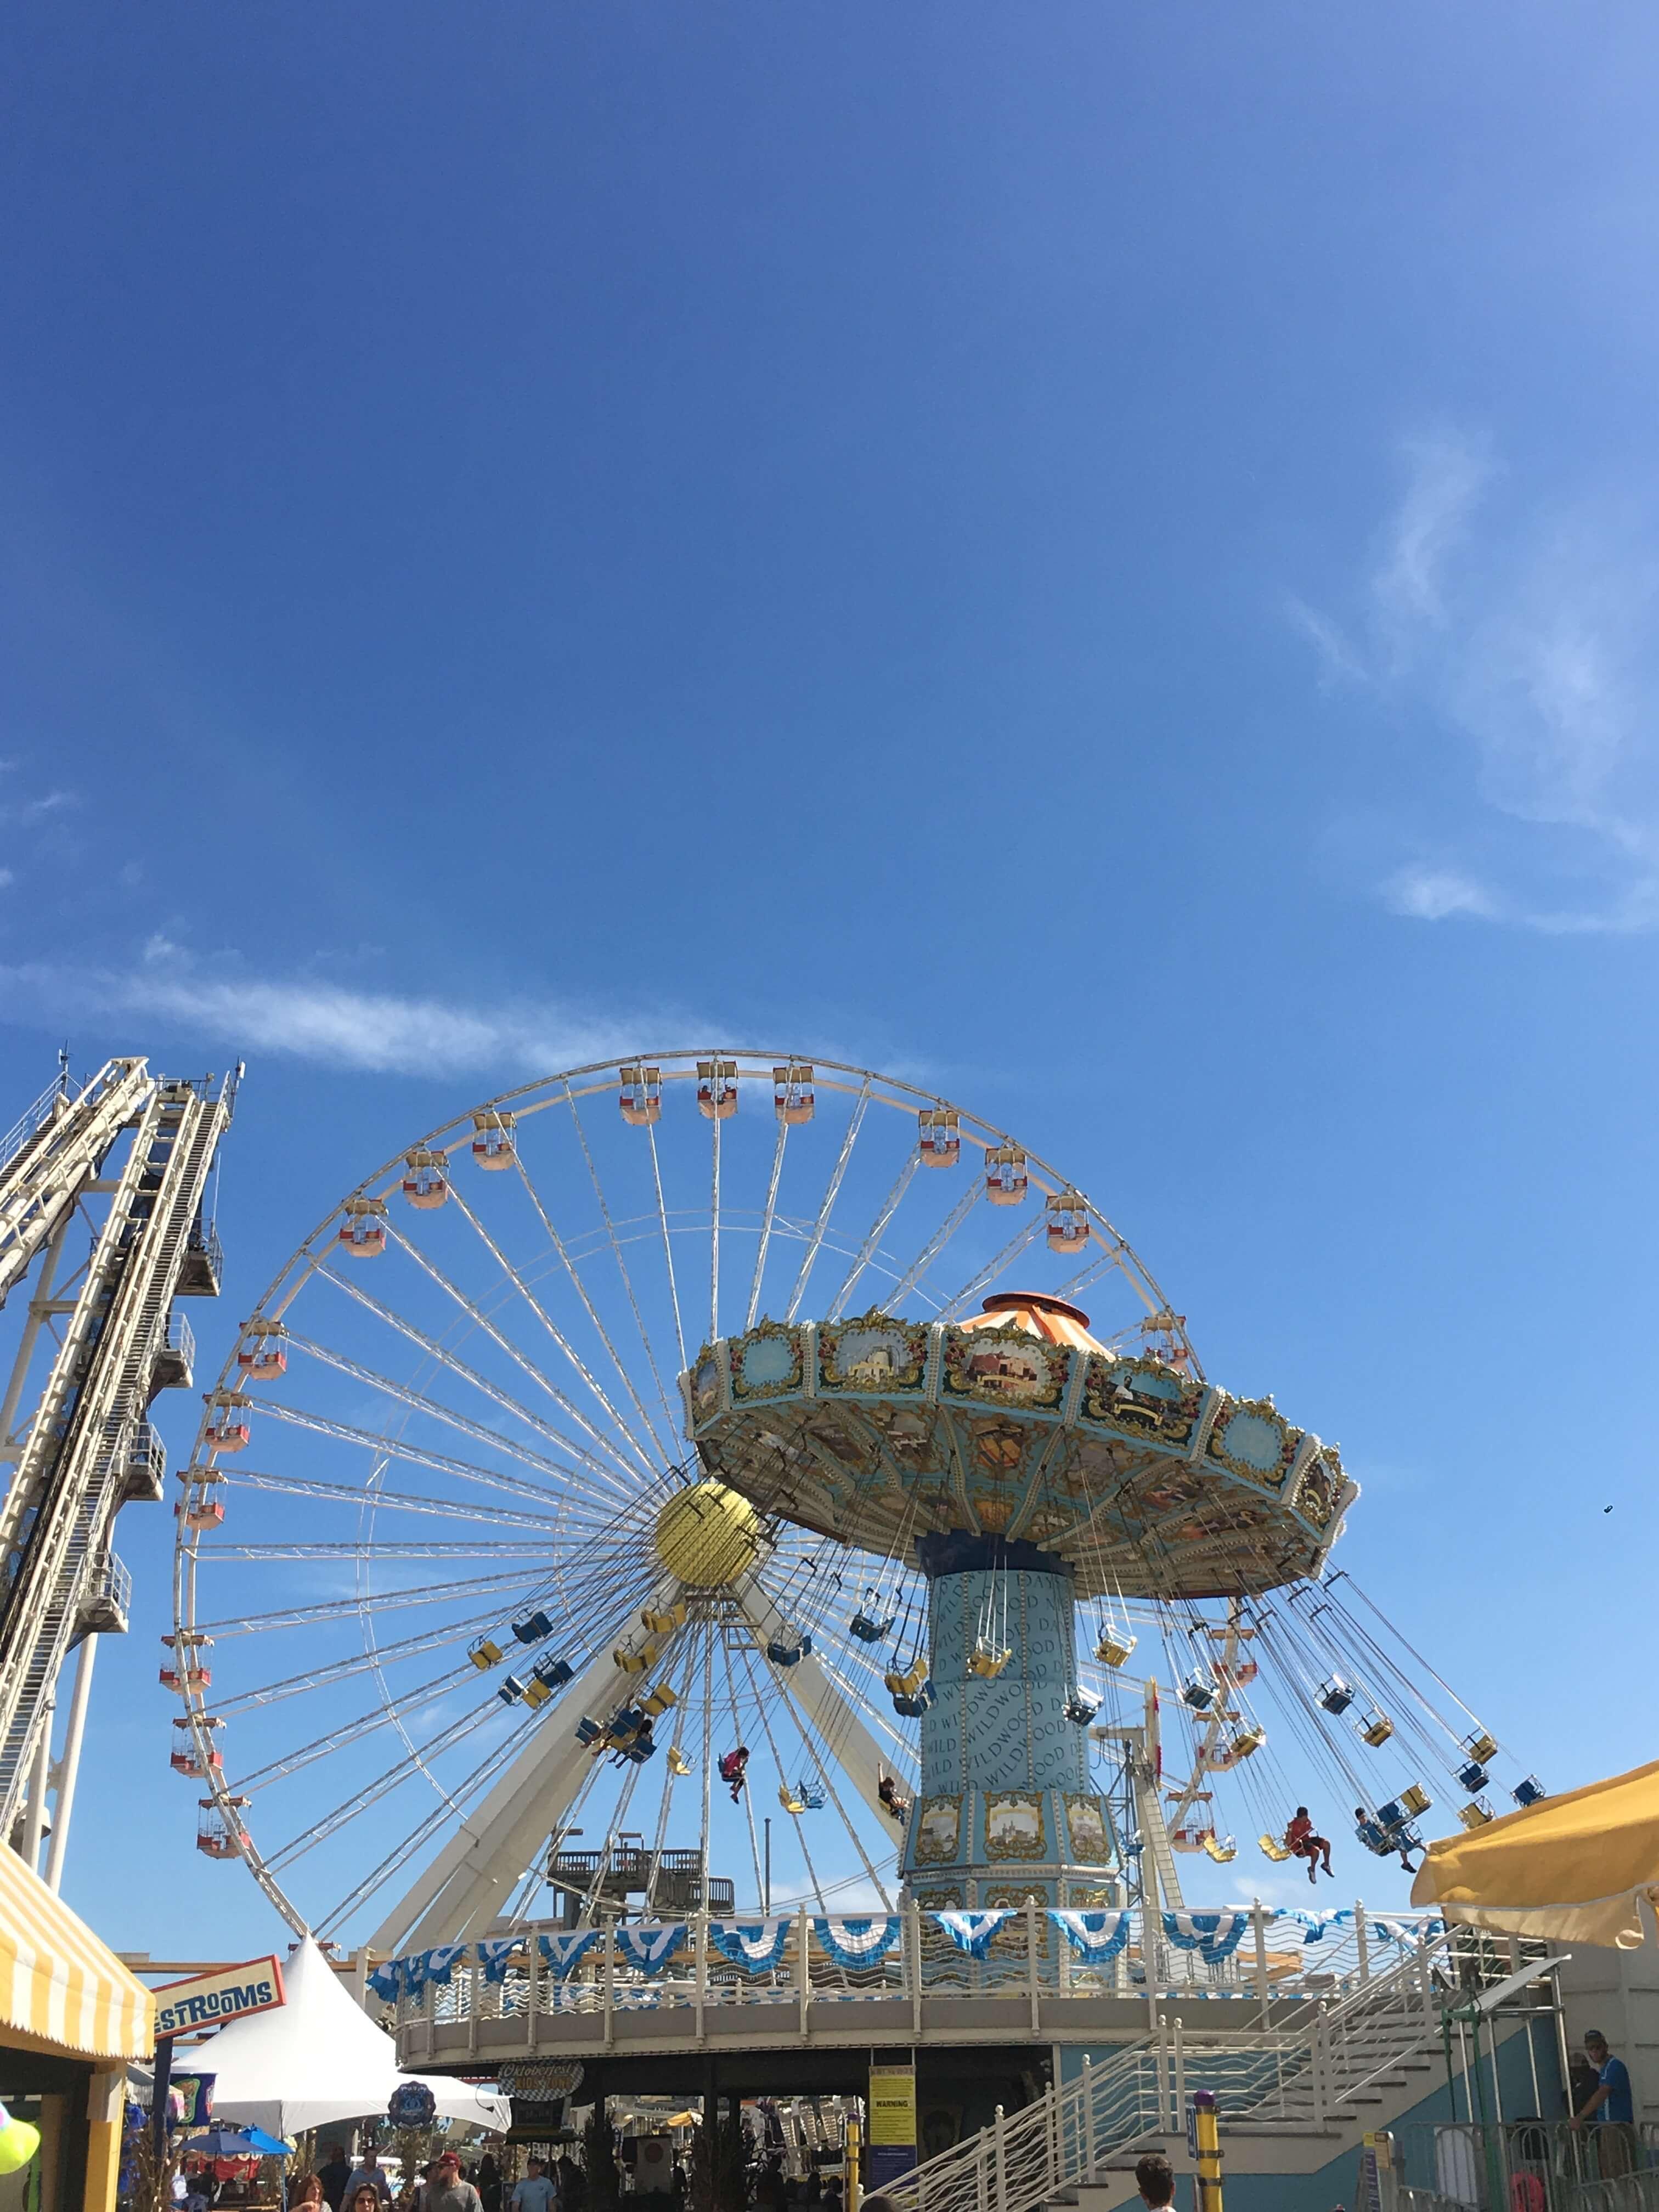 Fall Fun at Morey's Piers fun rides